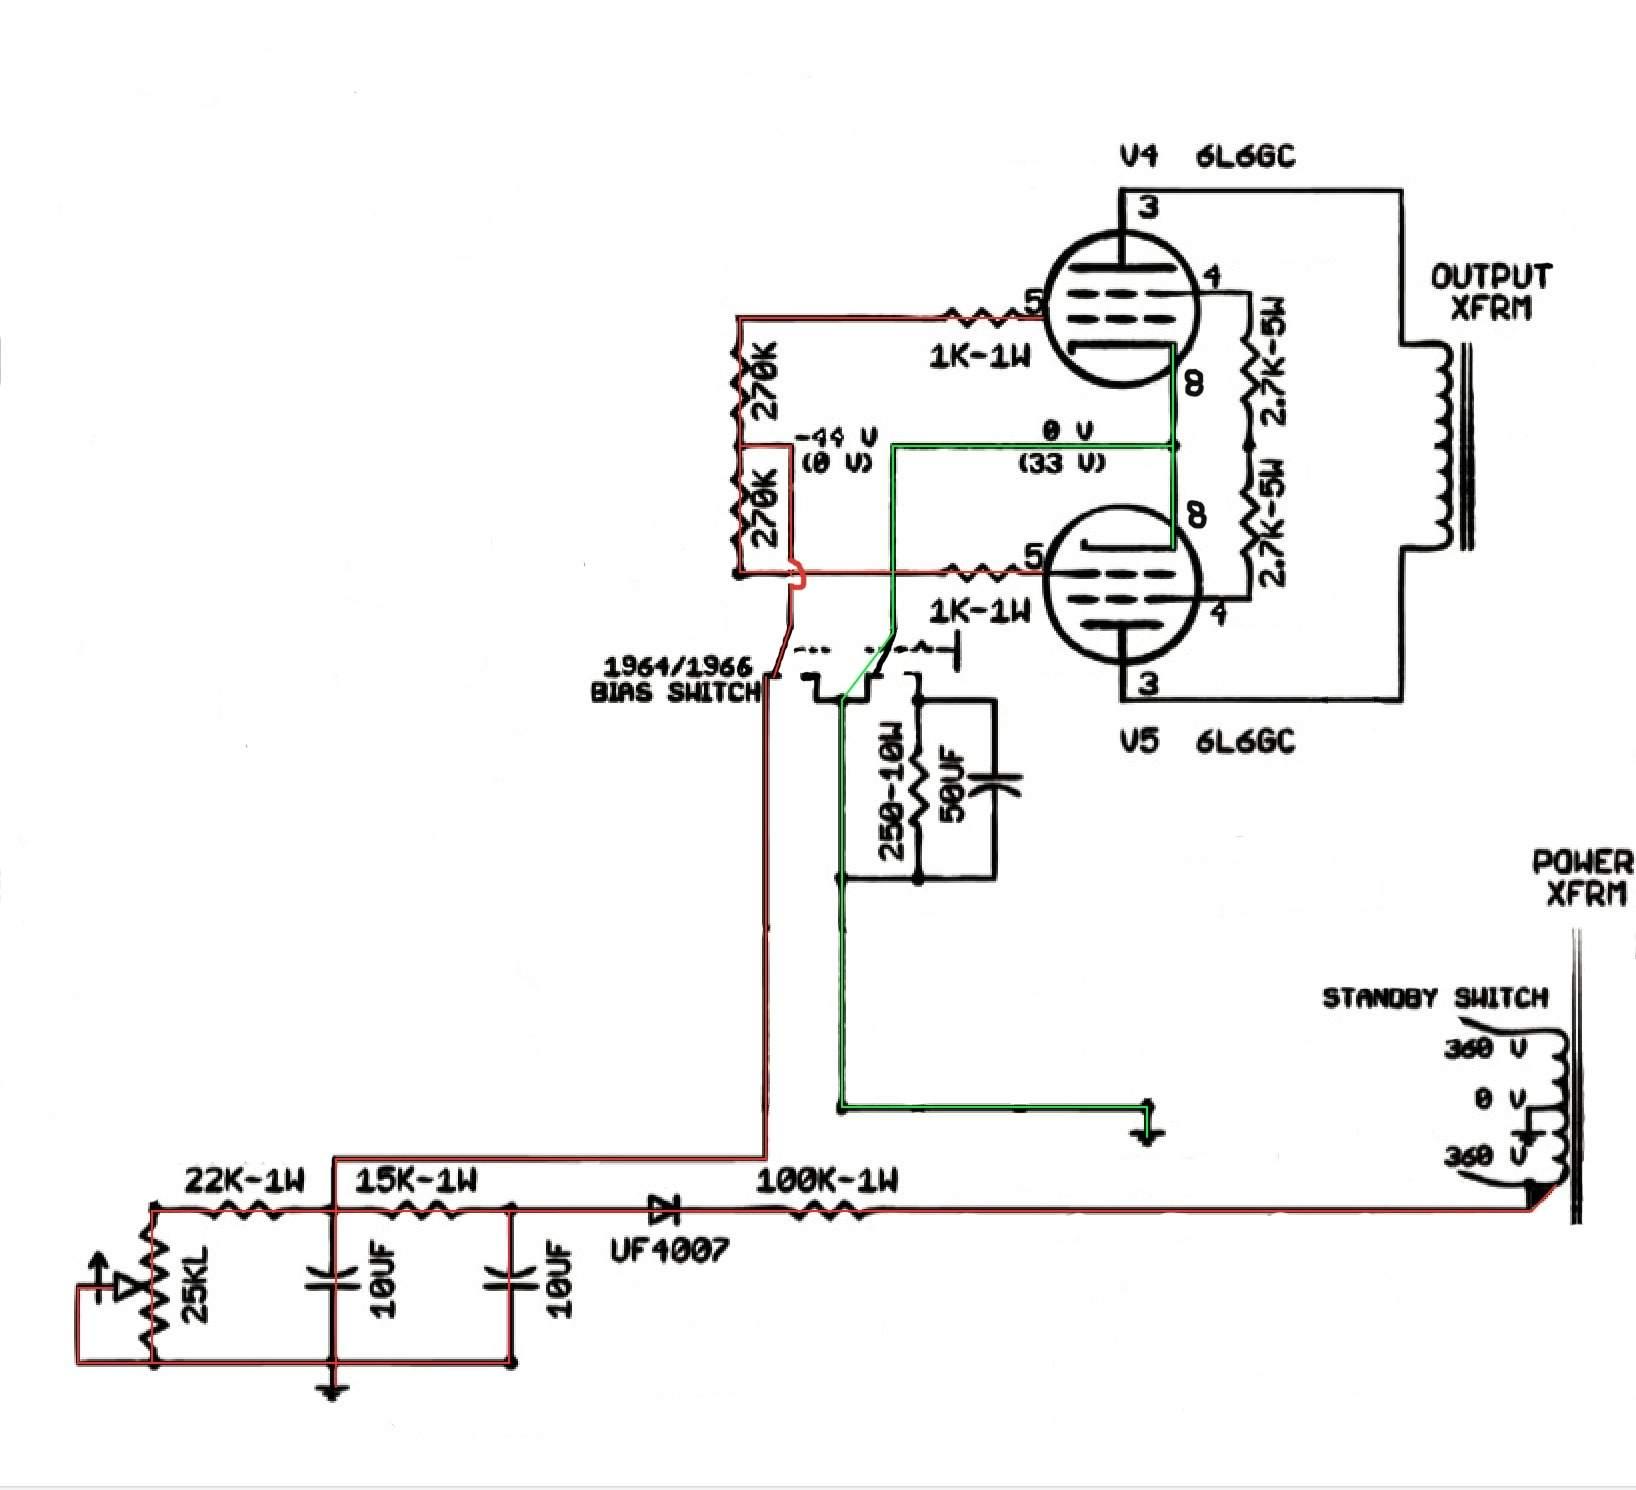 stiffening capacitor install